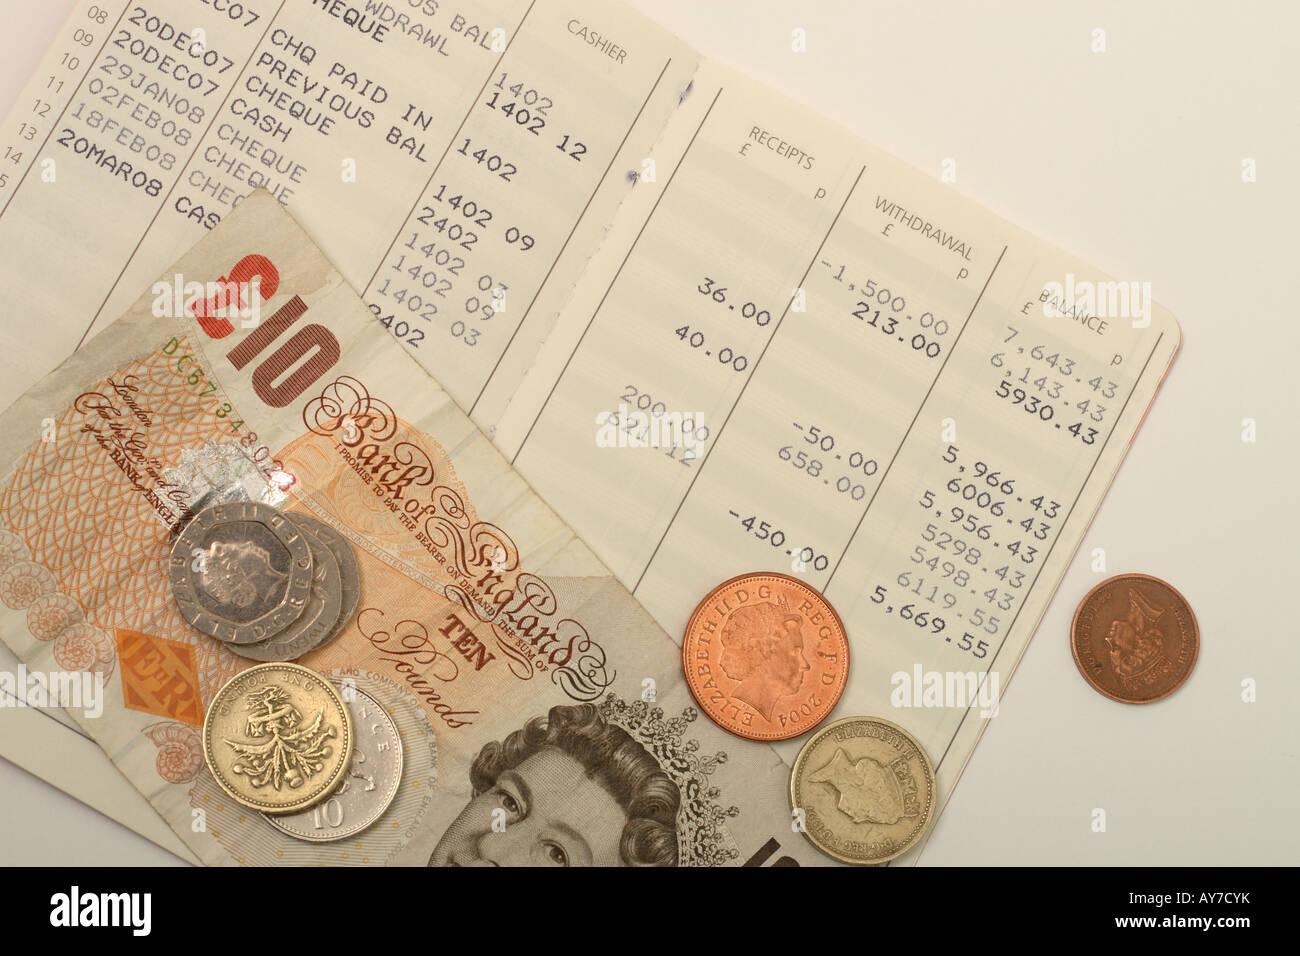 Savings account book building society money cash coin deposit - Stock Image